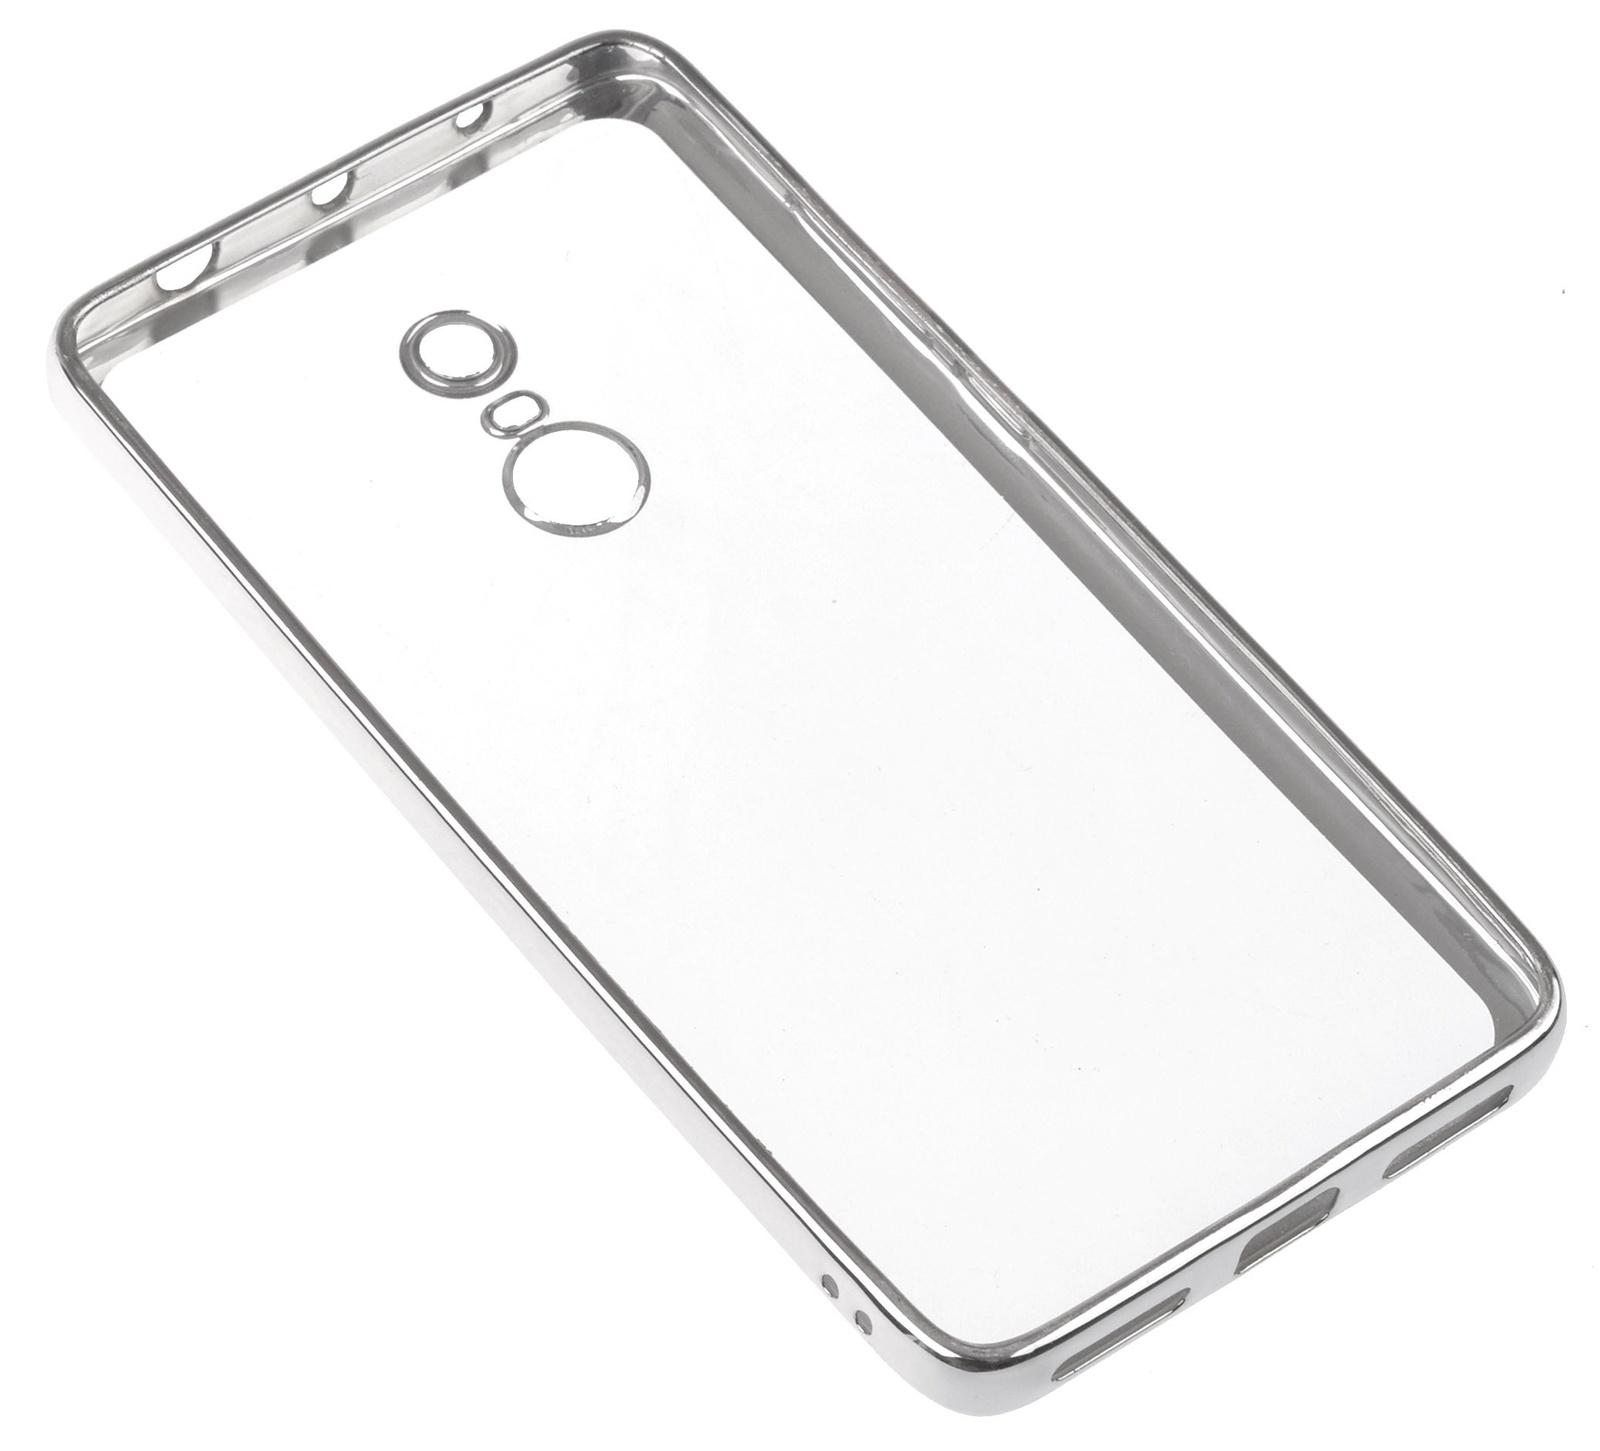 Чехол для сотового телефона skinBOX Silicone chrome border, 4630042520899, серебристый чехол для сотового телефона skinbox silicone chrome border 4630042524514 серебристый